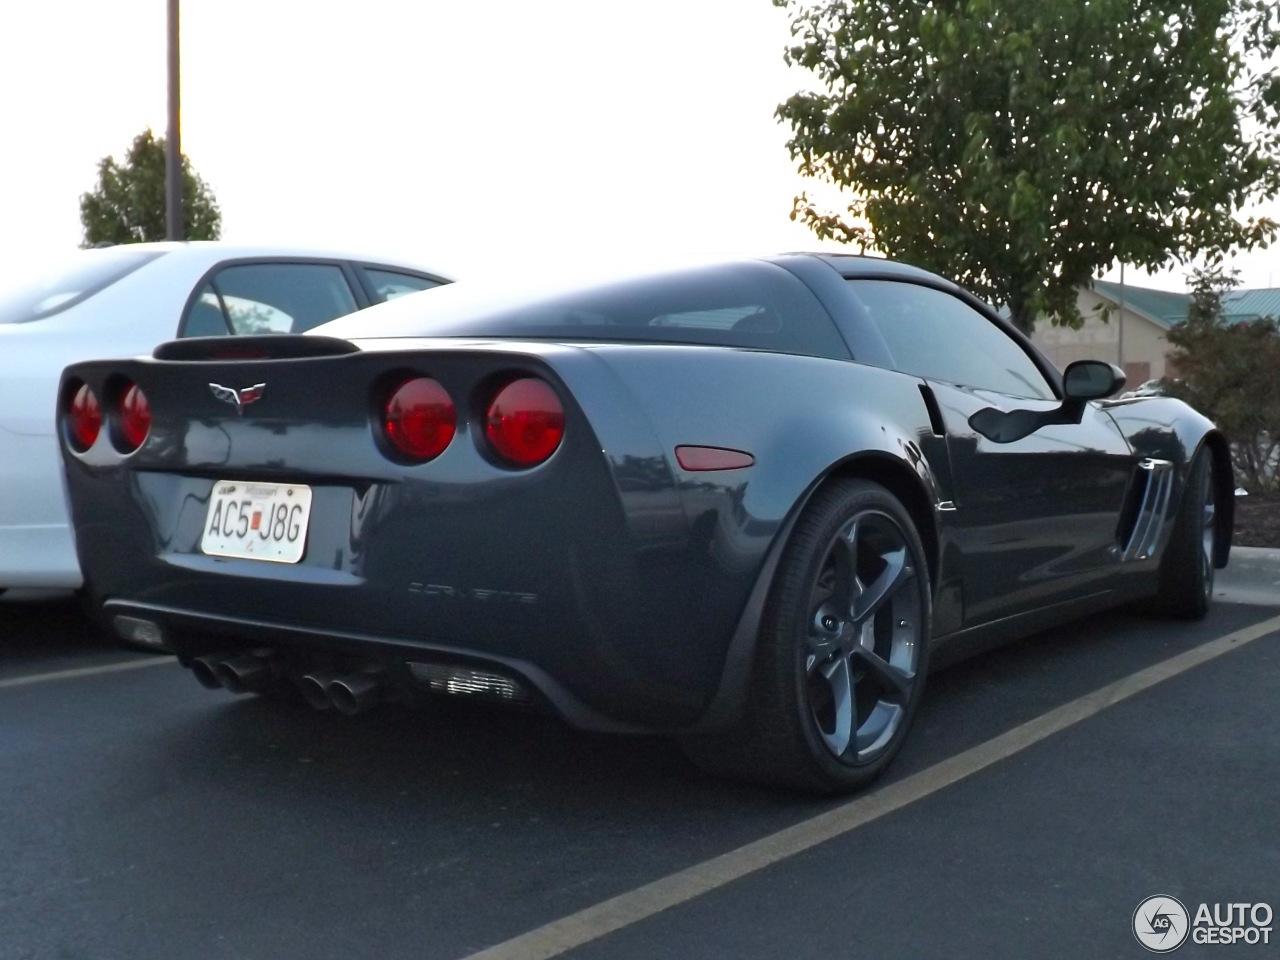 chevrolet corvette c6 grand sport 19 may 2013 autogespot. Black Bedroom Furniture Sets. Home Design Ideas